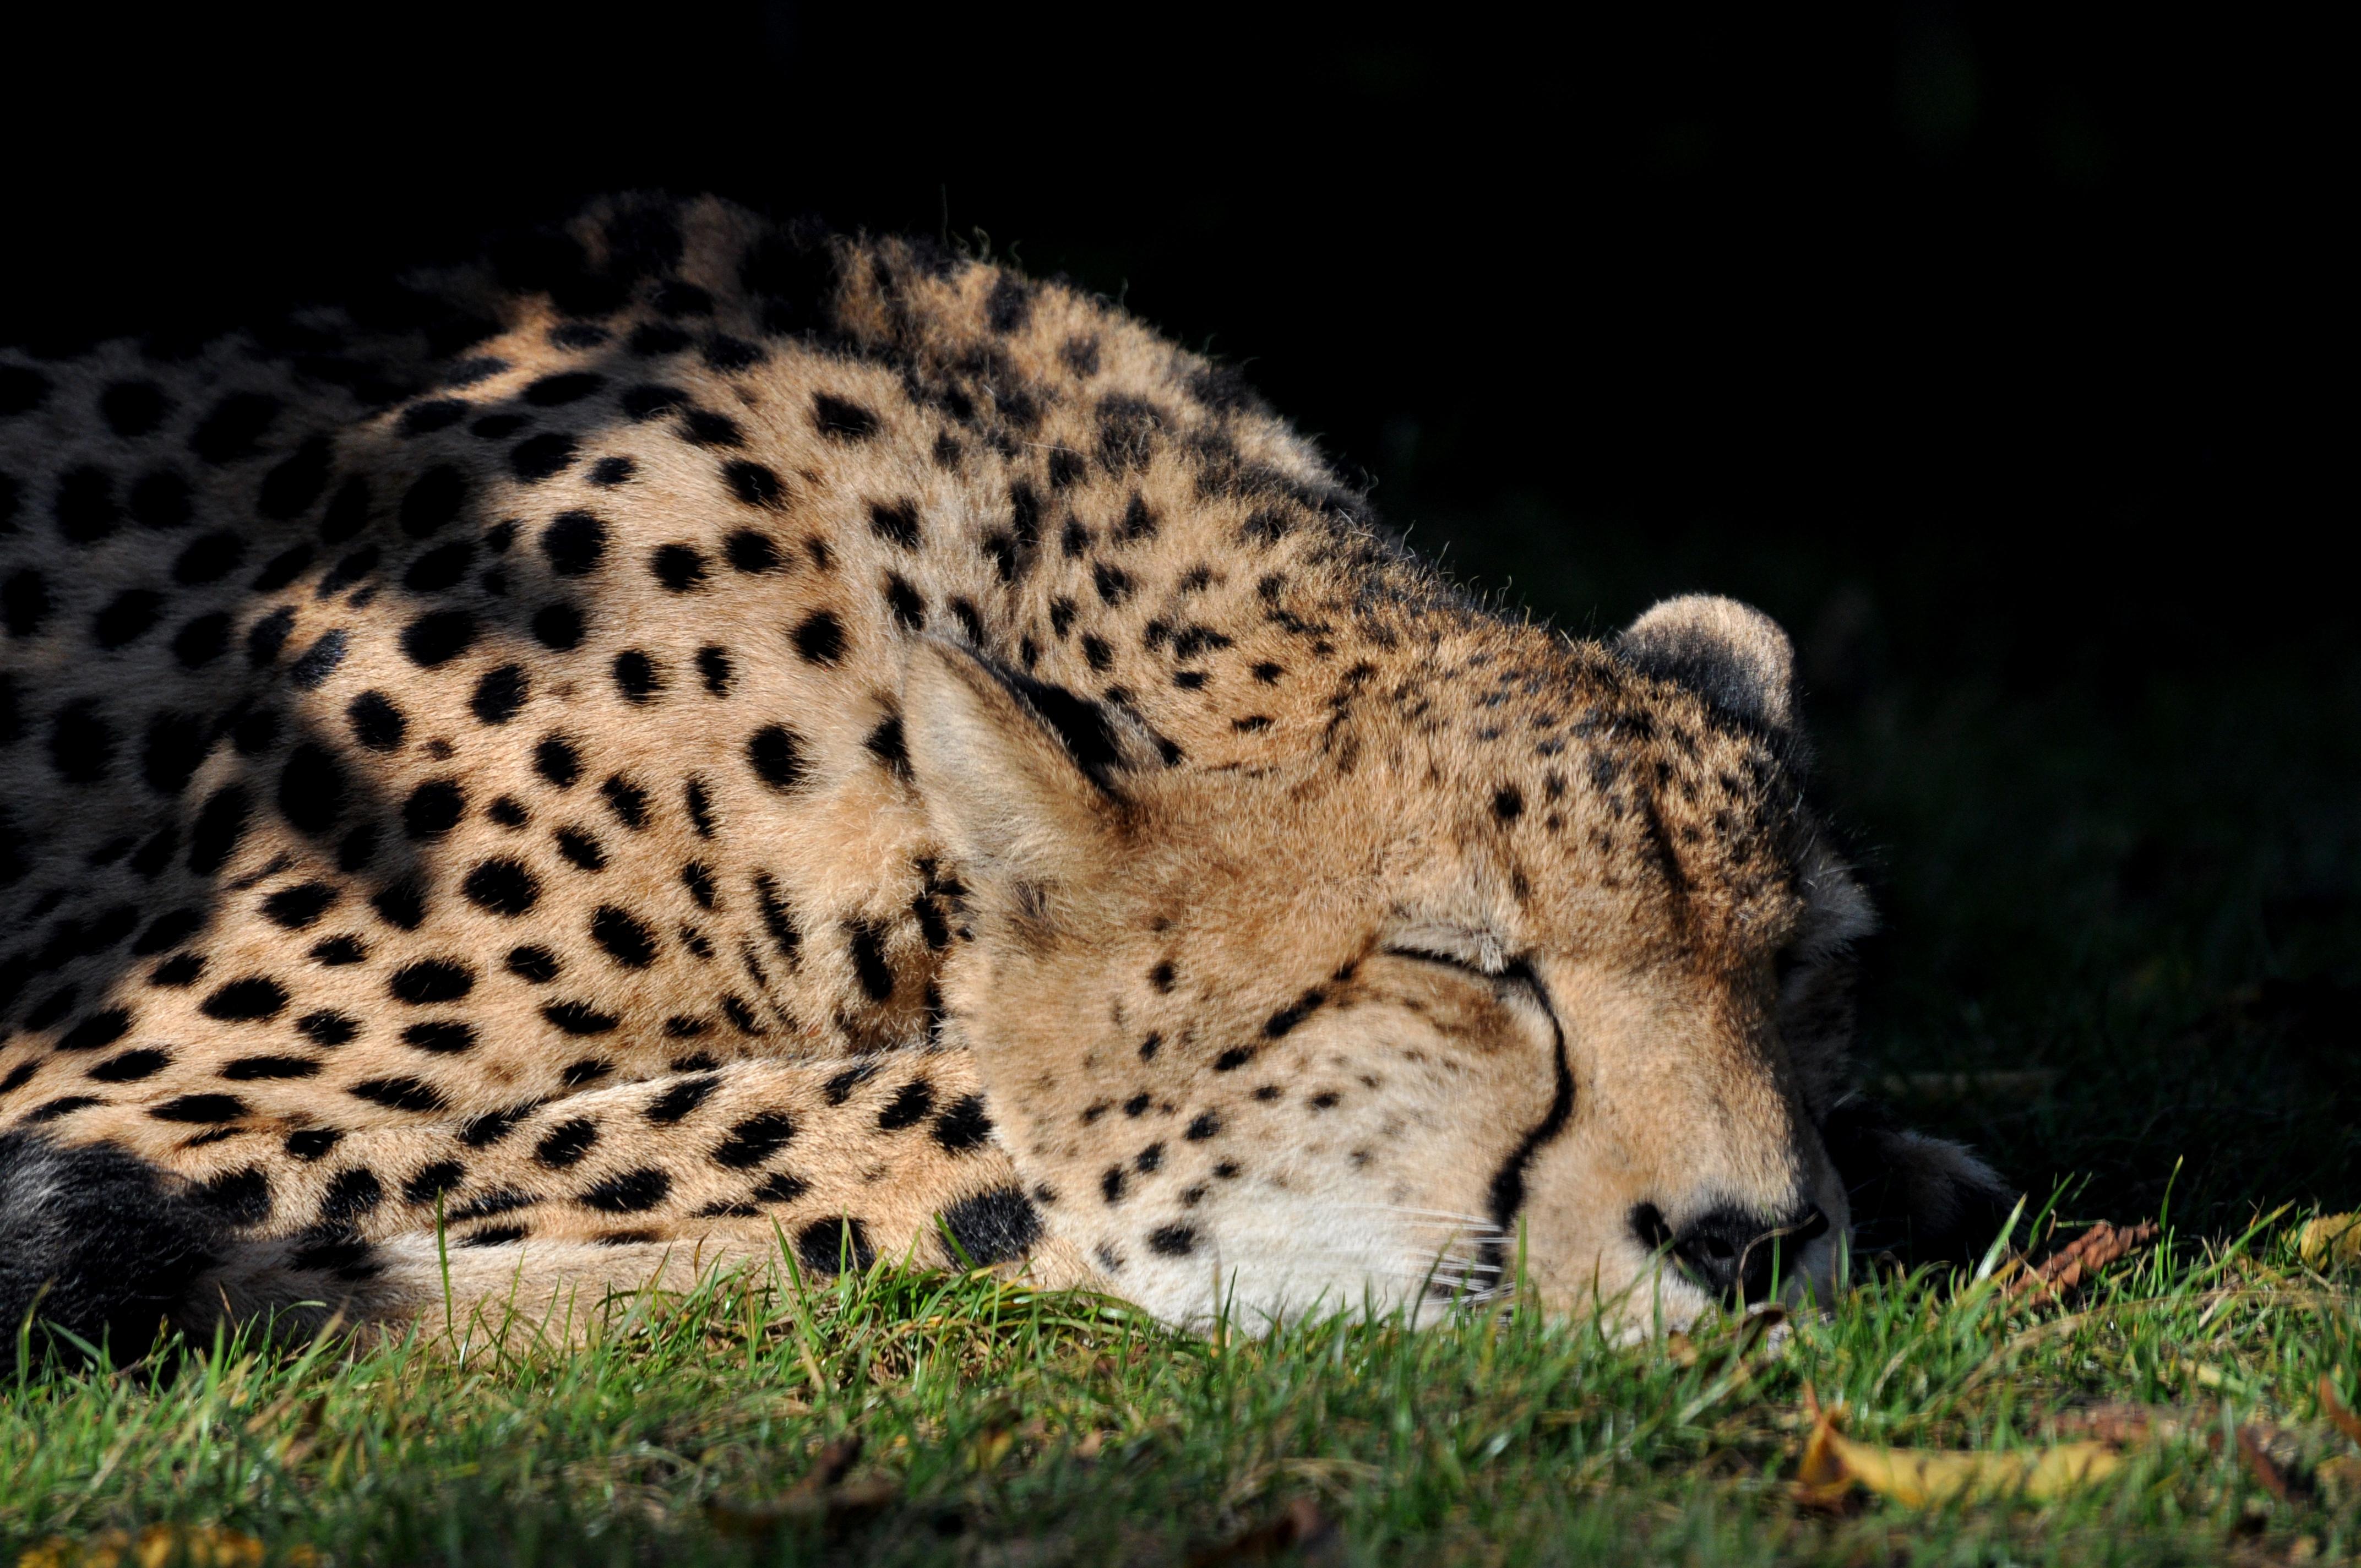 free photo sleeping cheetah resting lying sleeping free